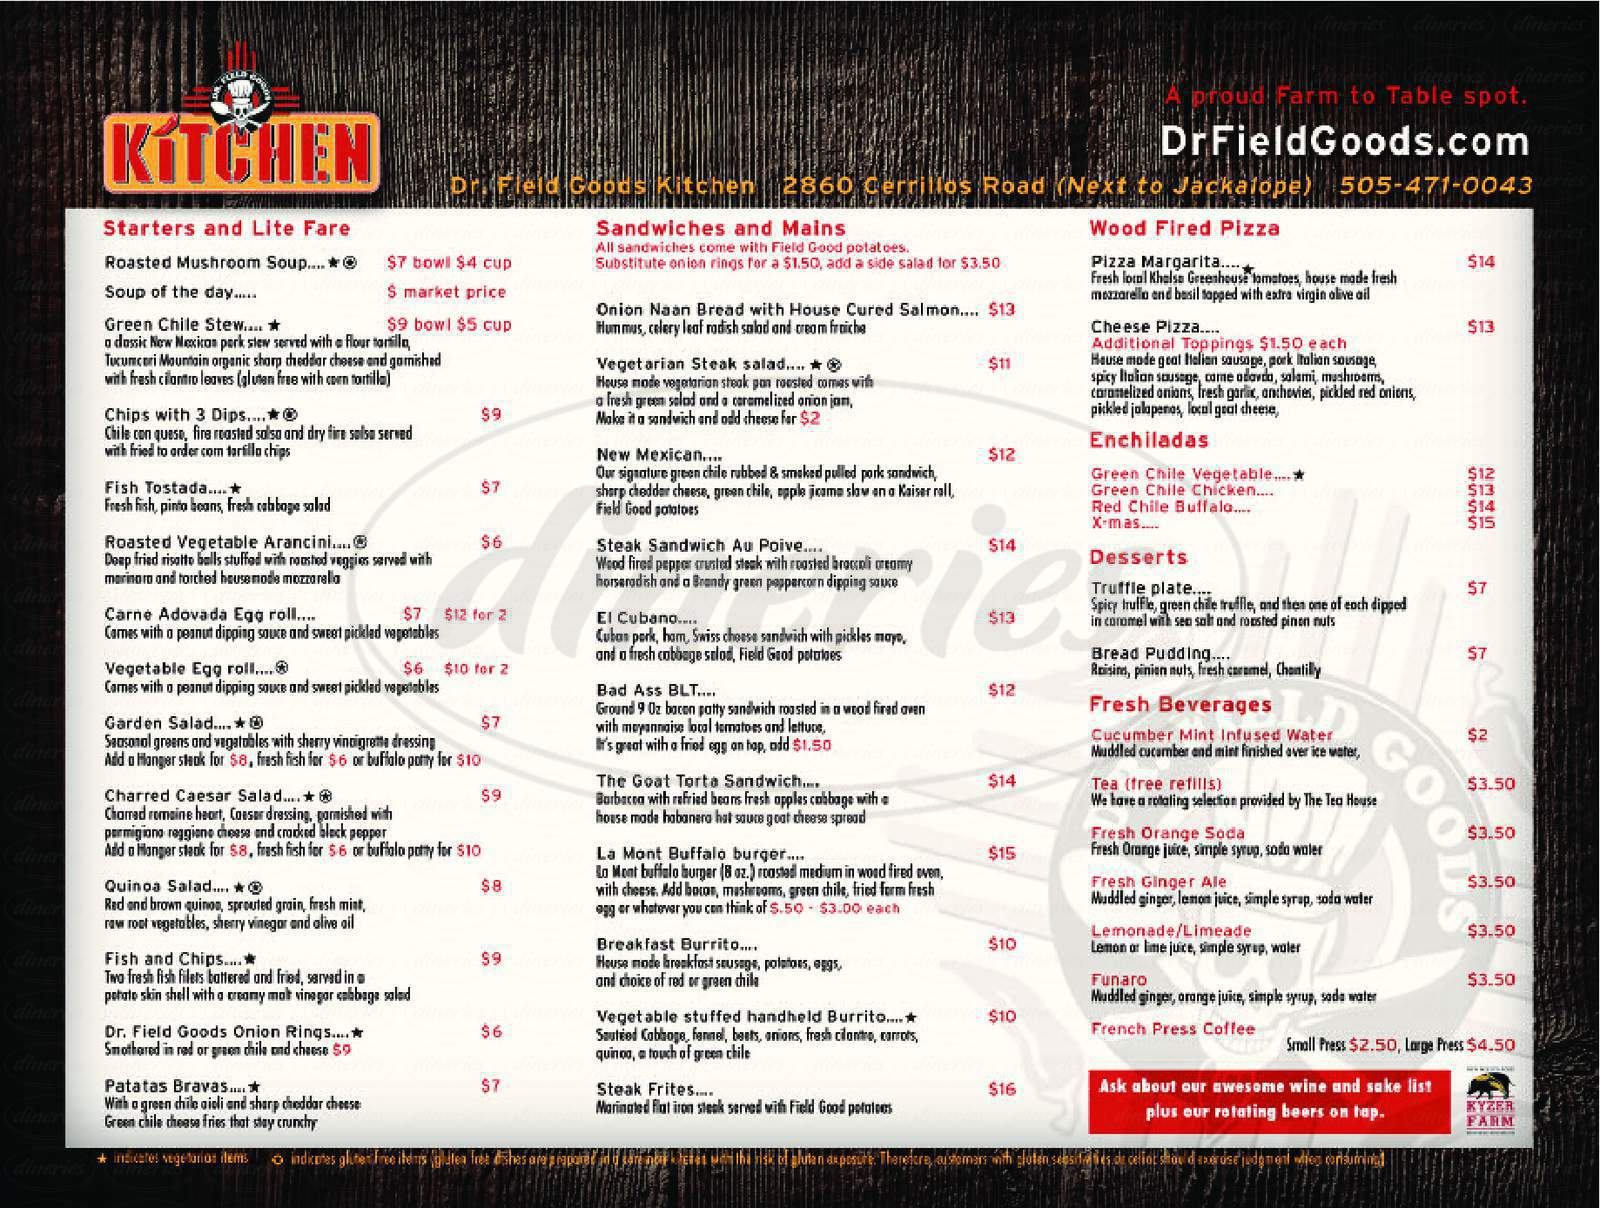 menu for Dr. Field Goods Kitchen